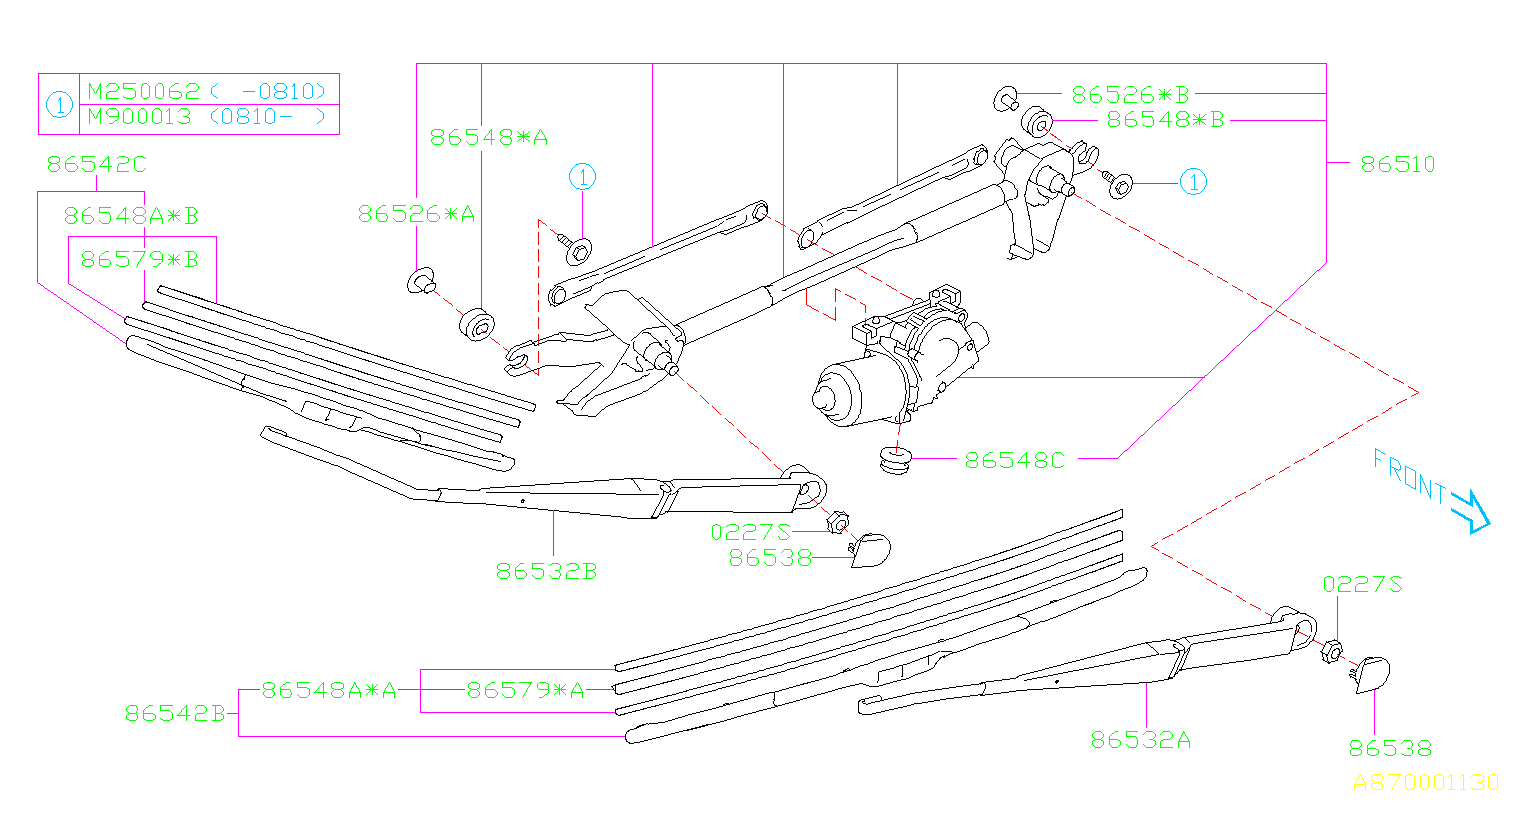 86510sc011 - Motor And Link Windshield Wiper  Make